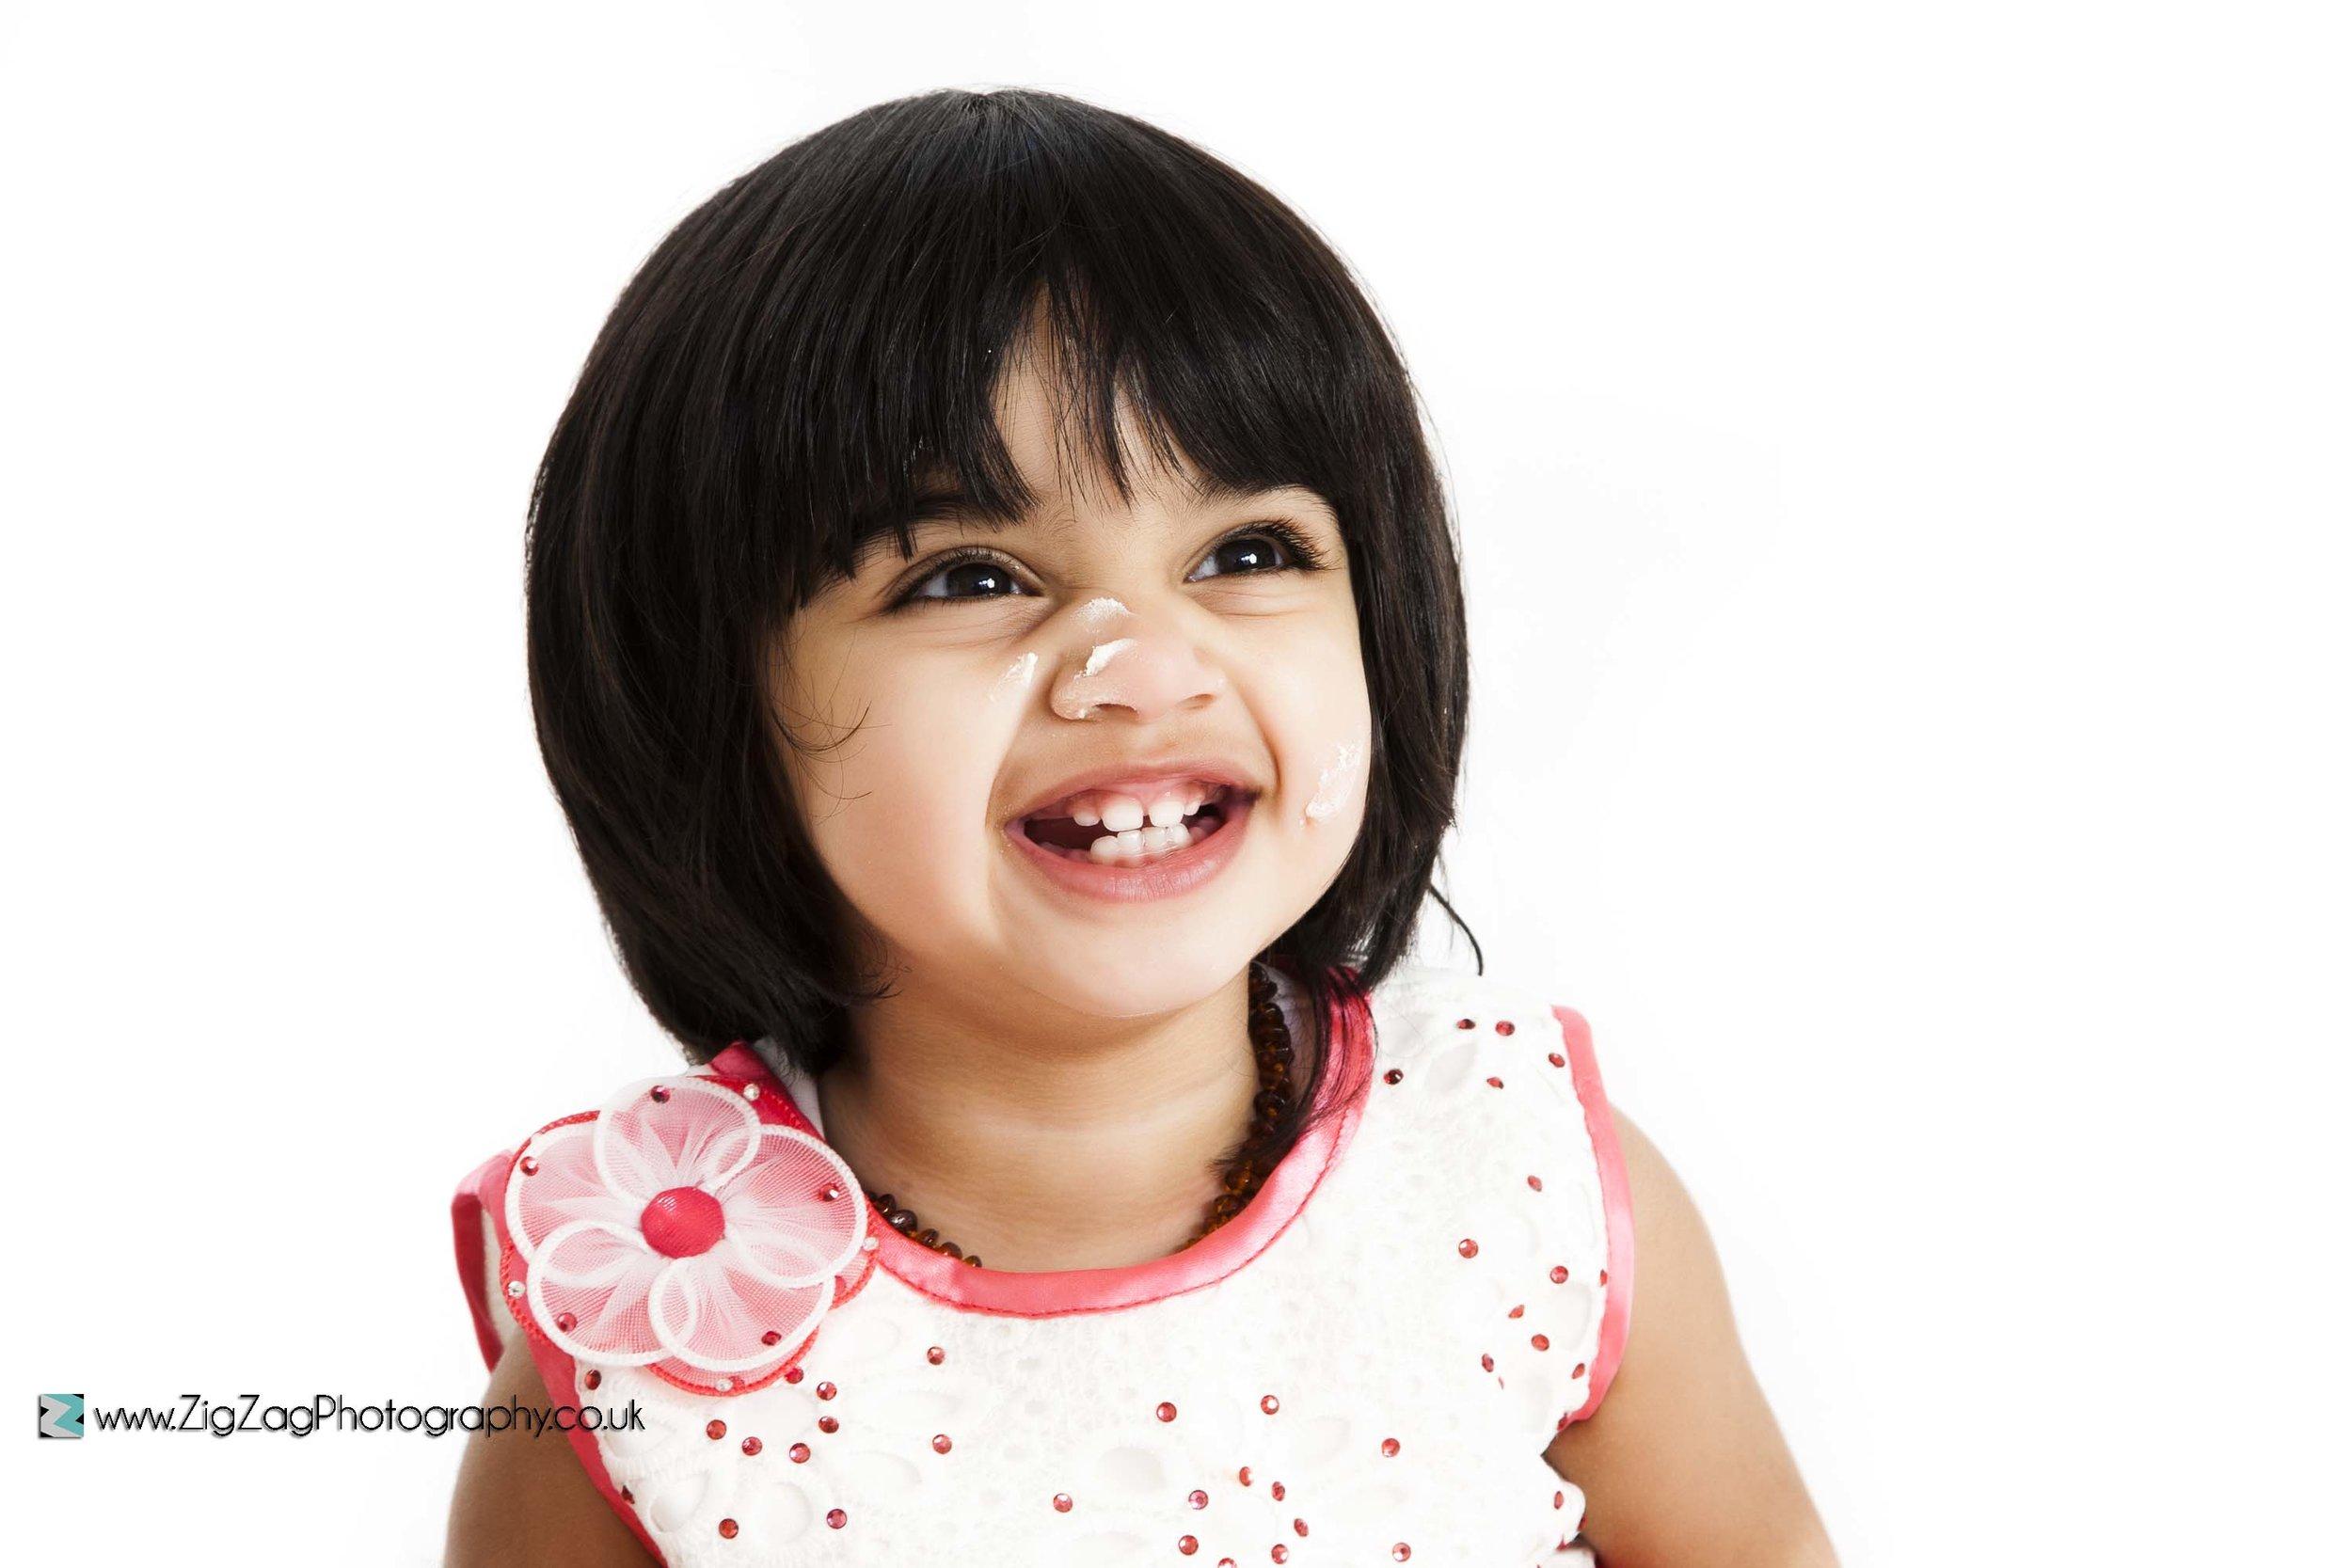 photography-studio-leicester-photoshoot-child-portrait-kid-girl-brunette-smile.jpg